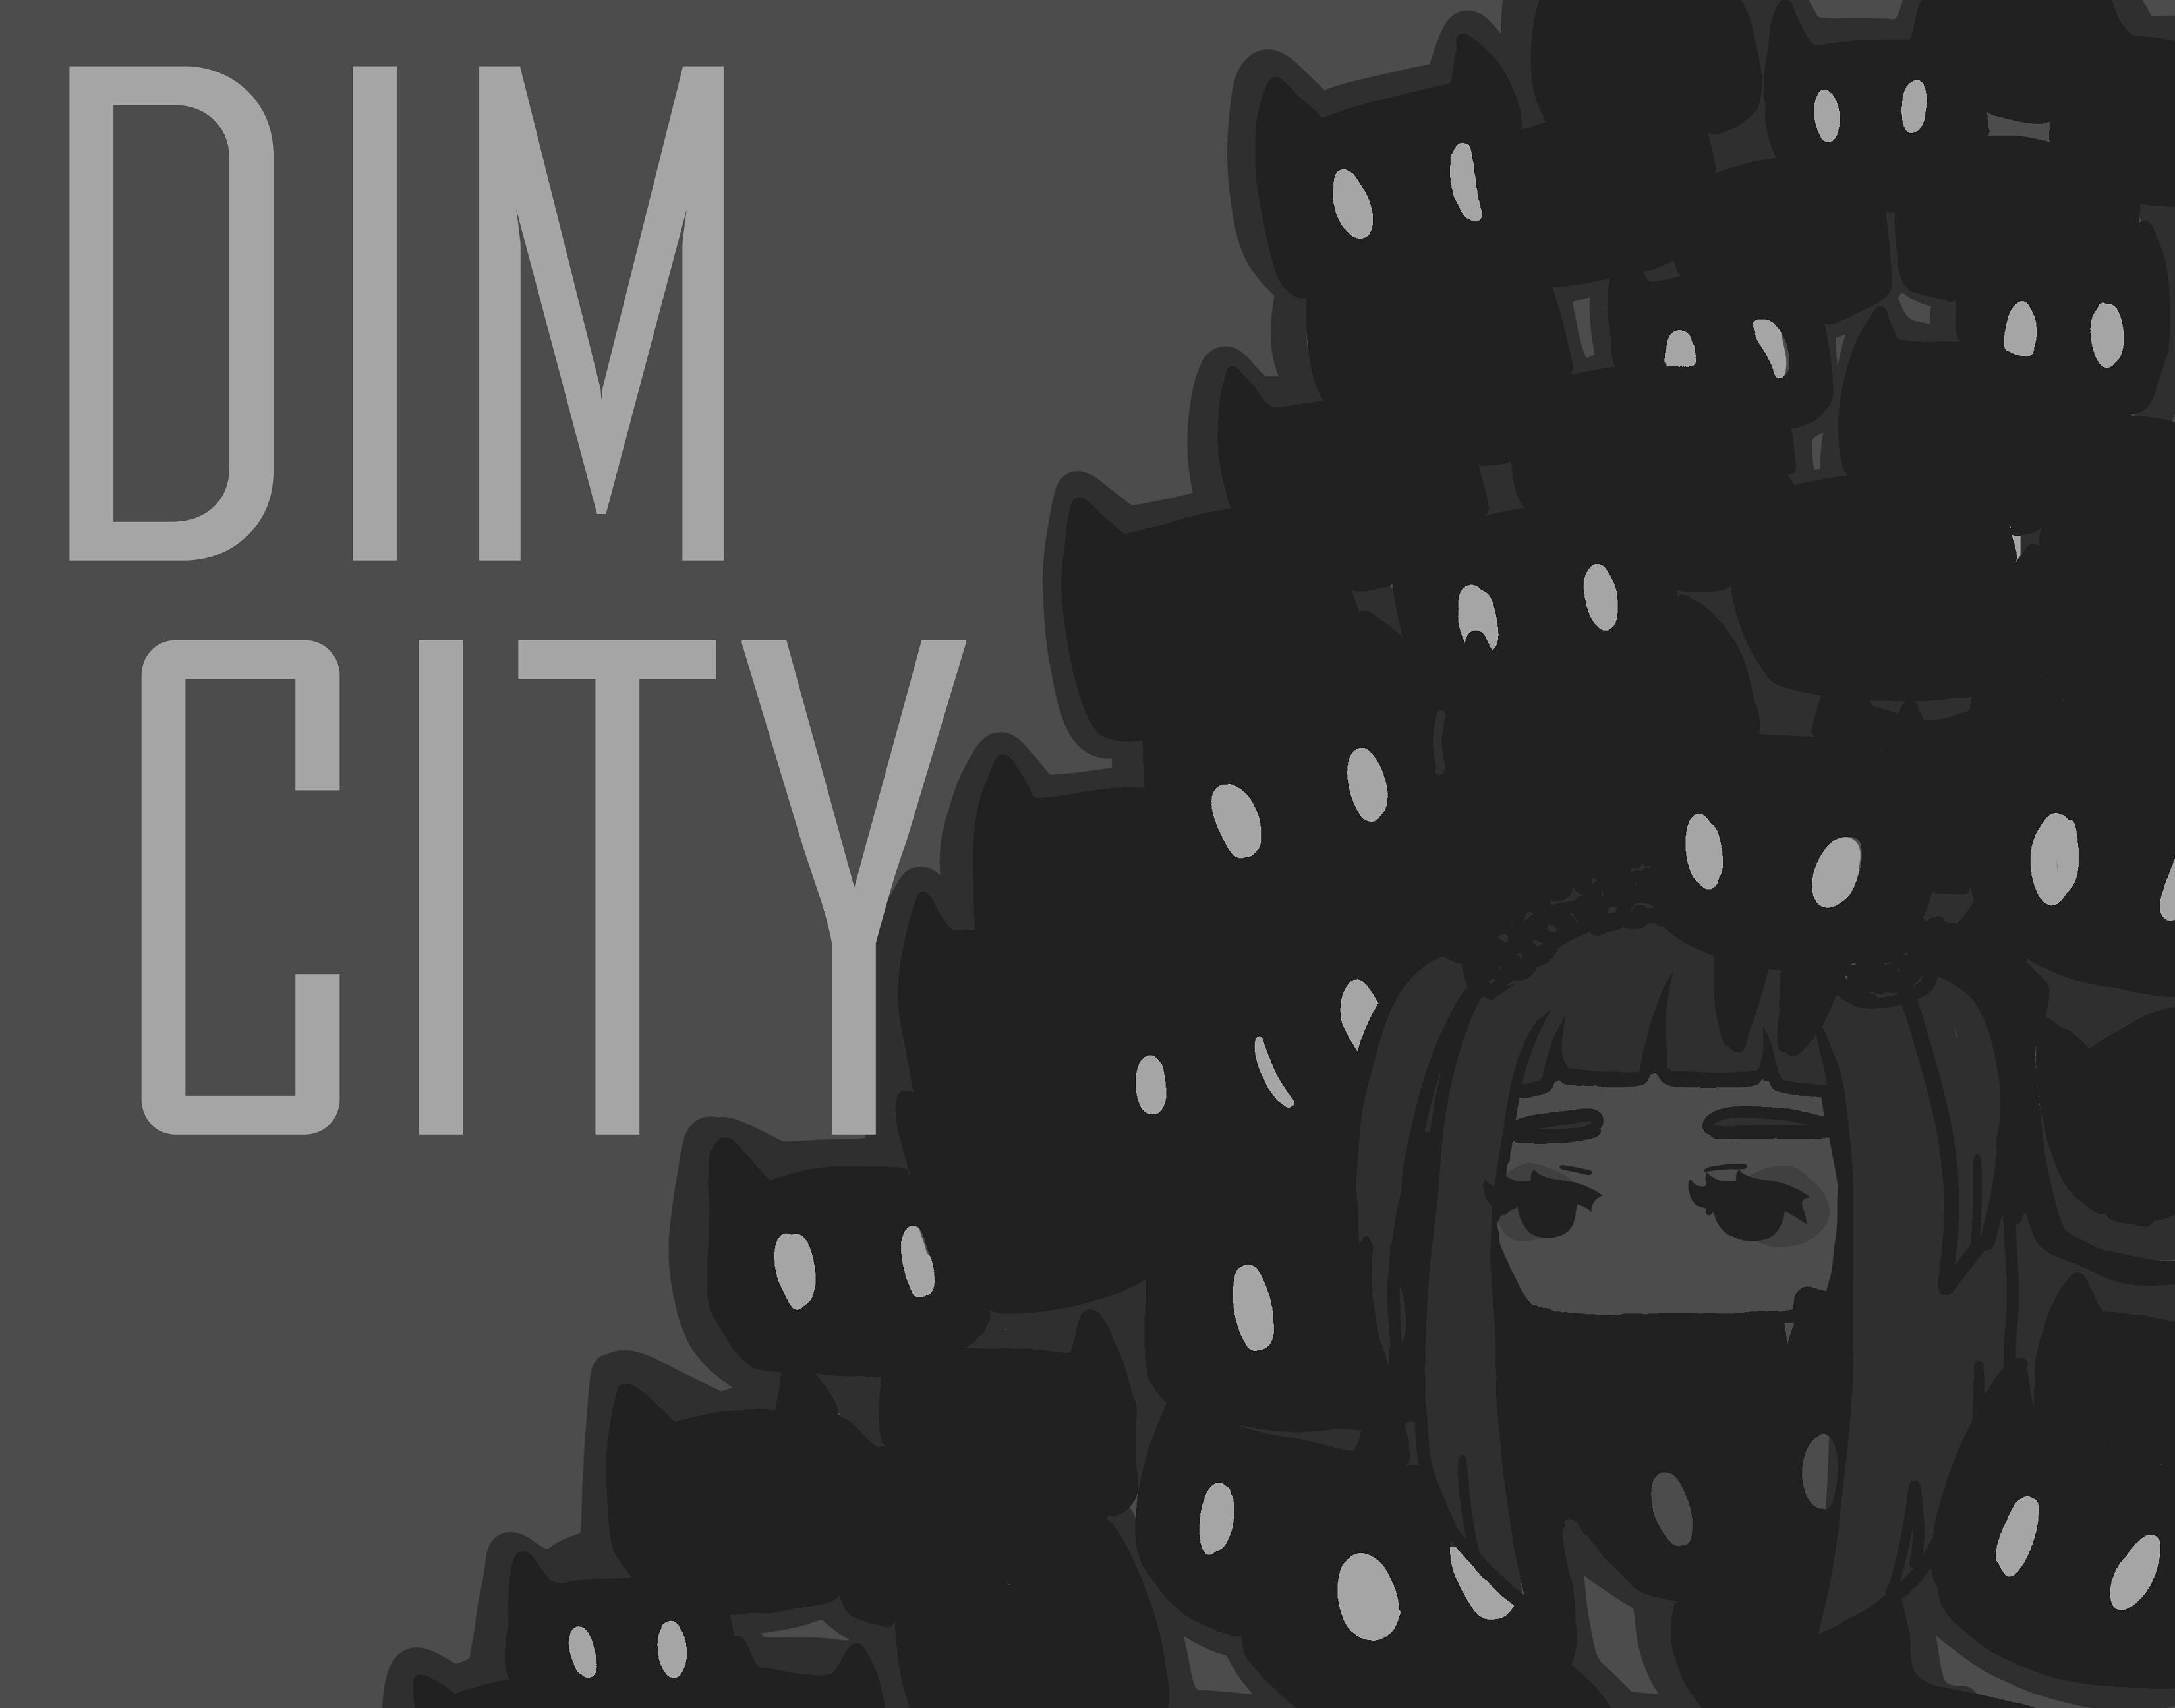 Dim City